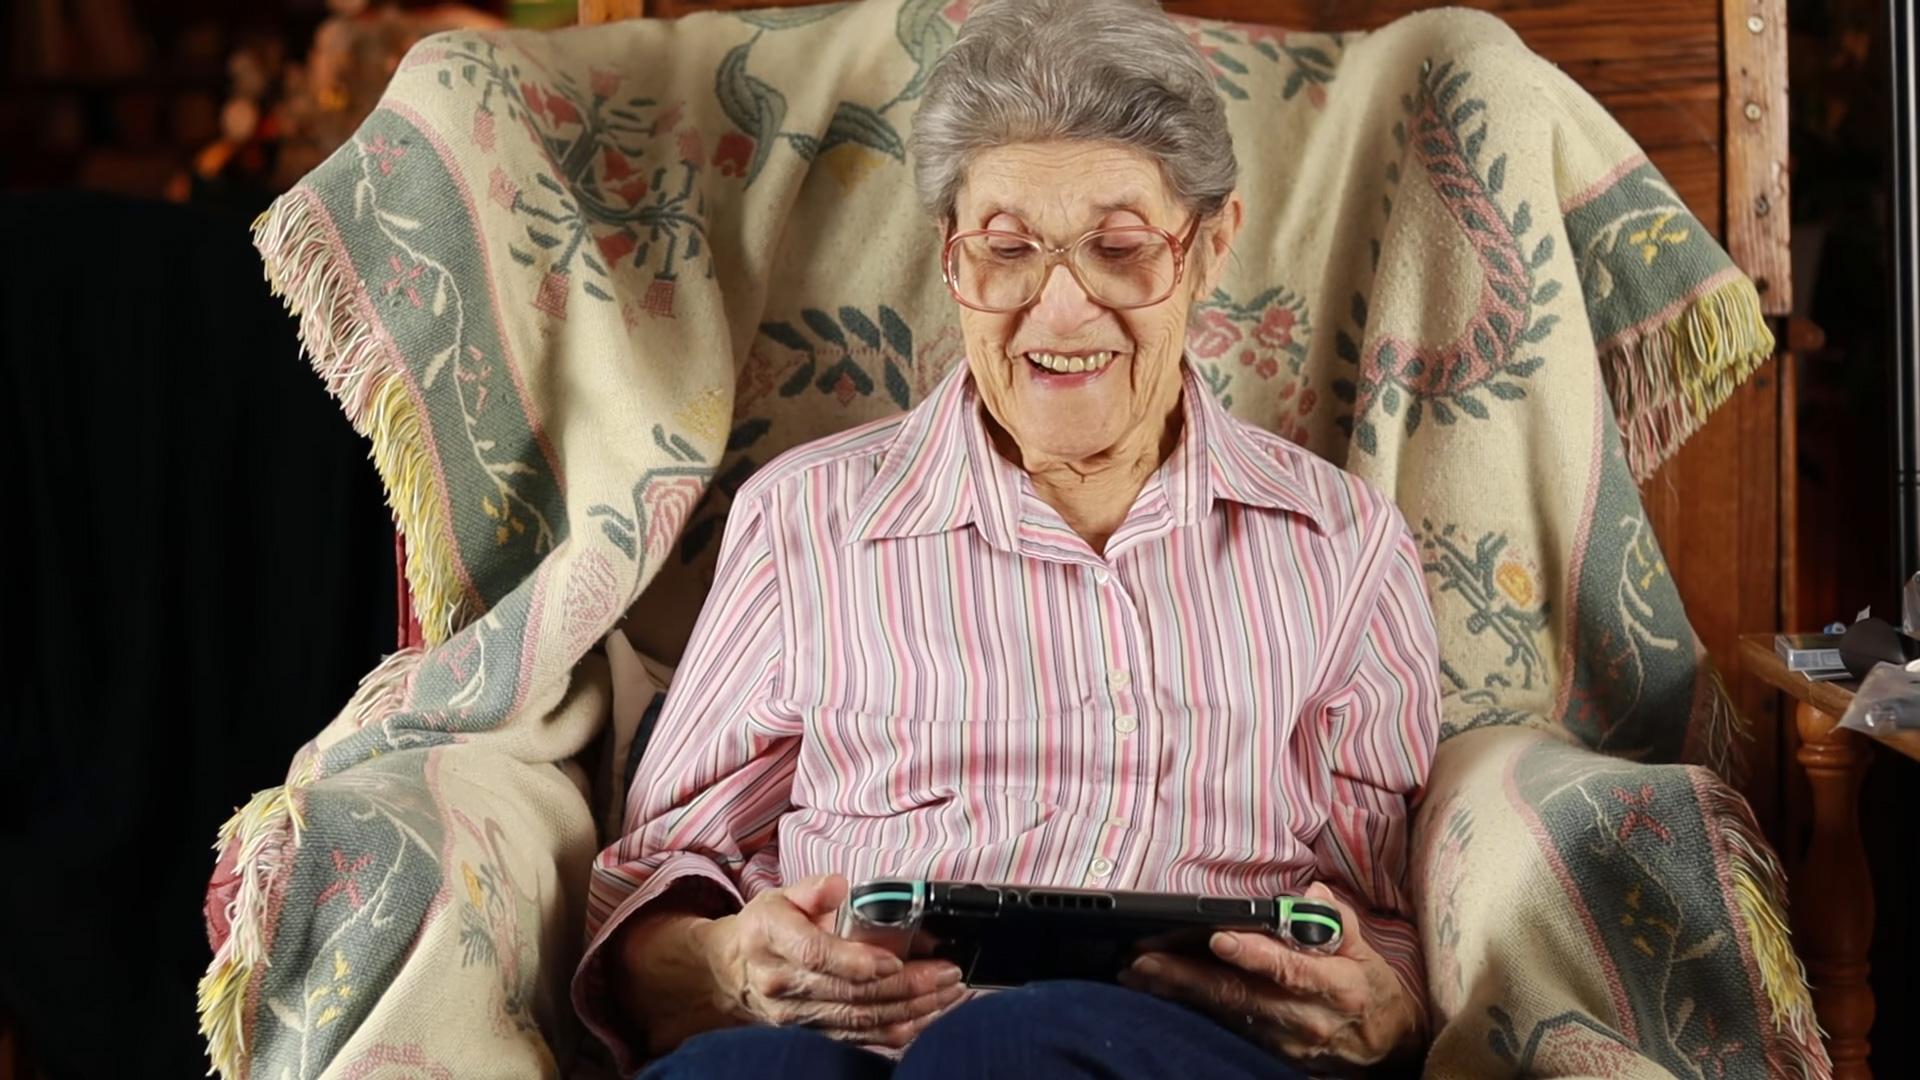 585833 Animal Crossing New Horizons grandma